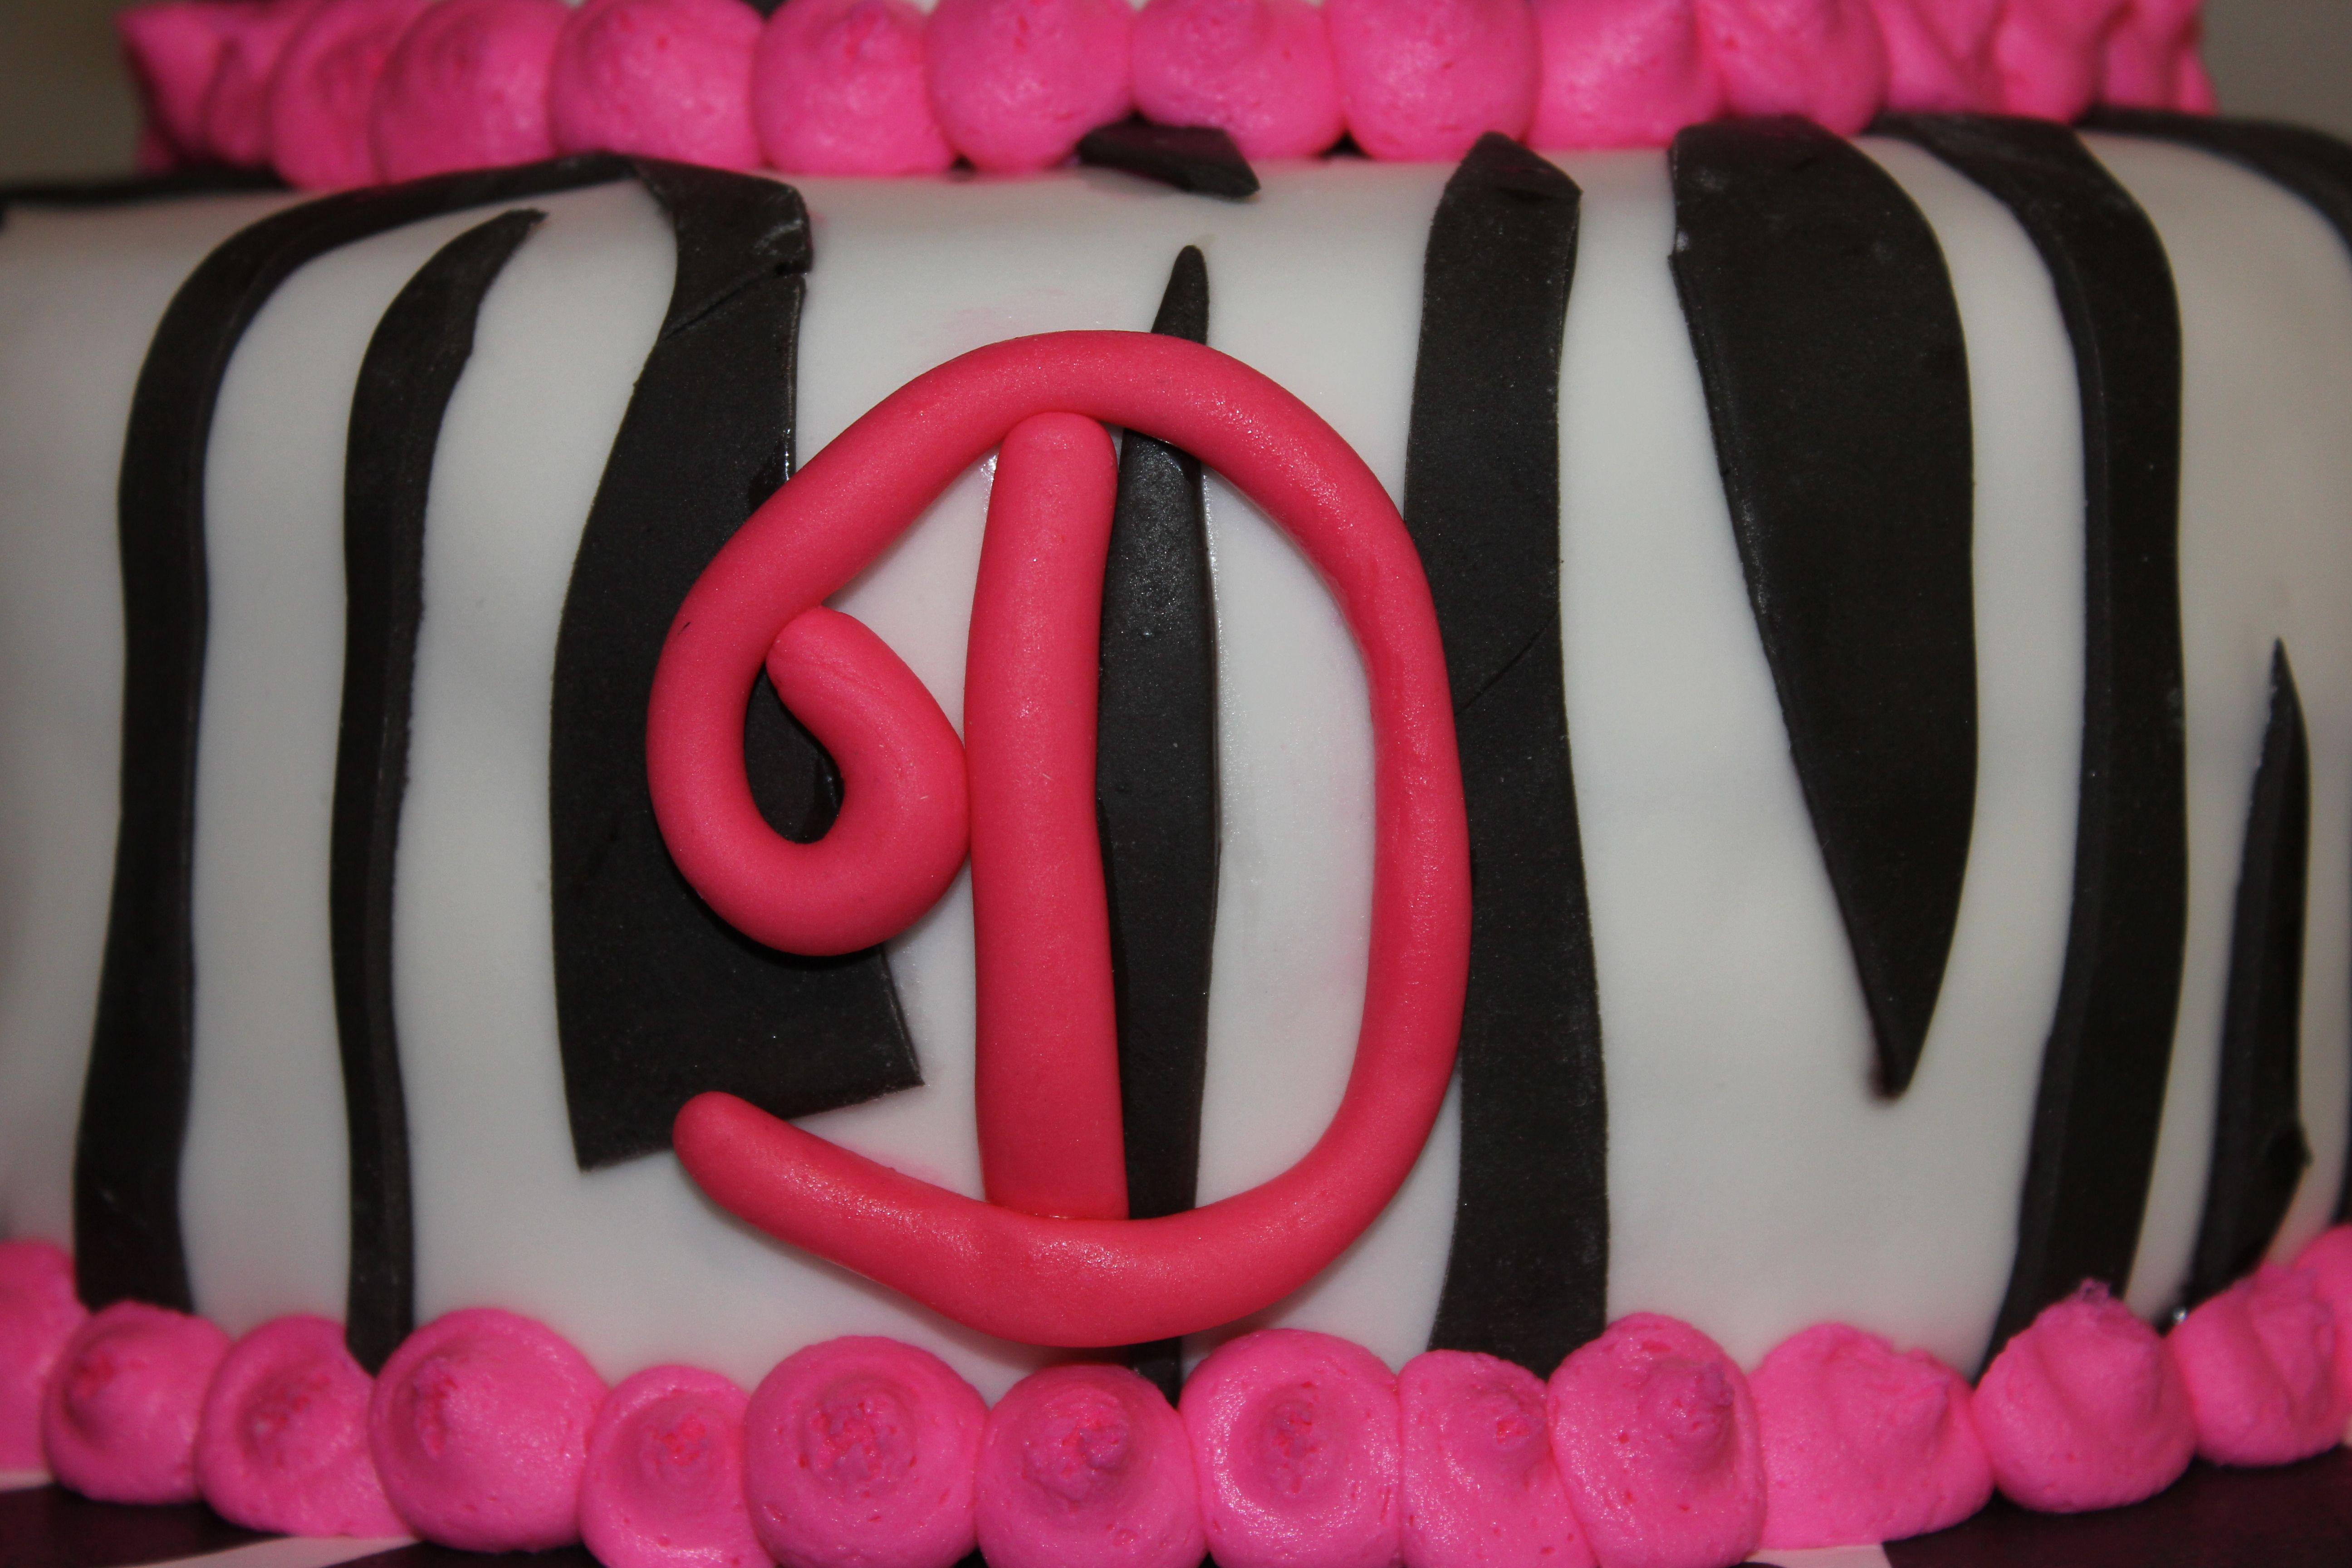 Zebra cake fondant decoration.